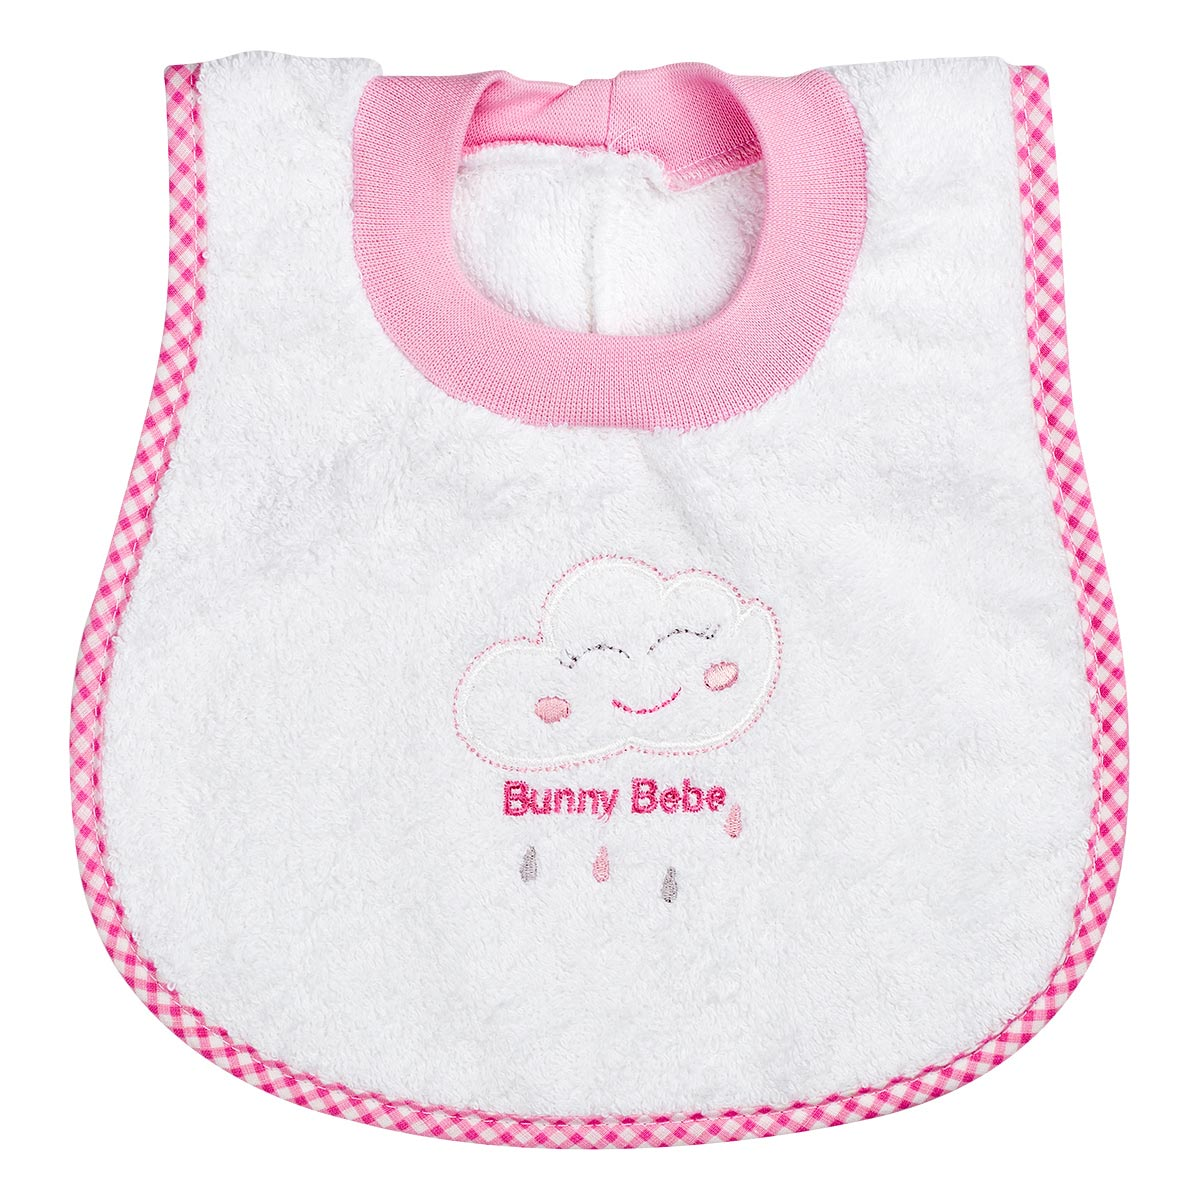 "Bunny bebe σαλιάρα πετσετέ ""ποδίτσα"" συννεφάκι ροζ"